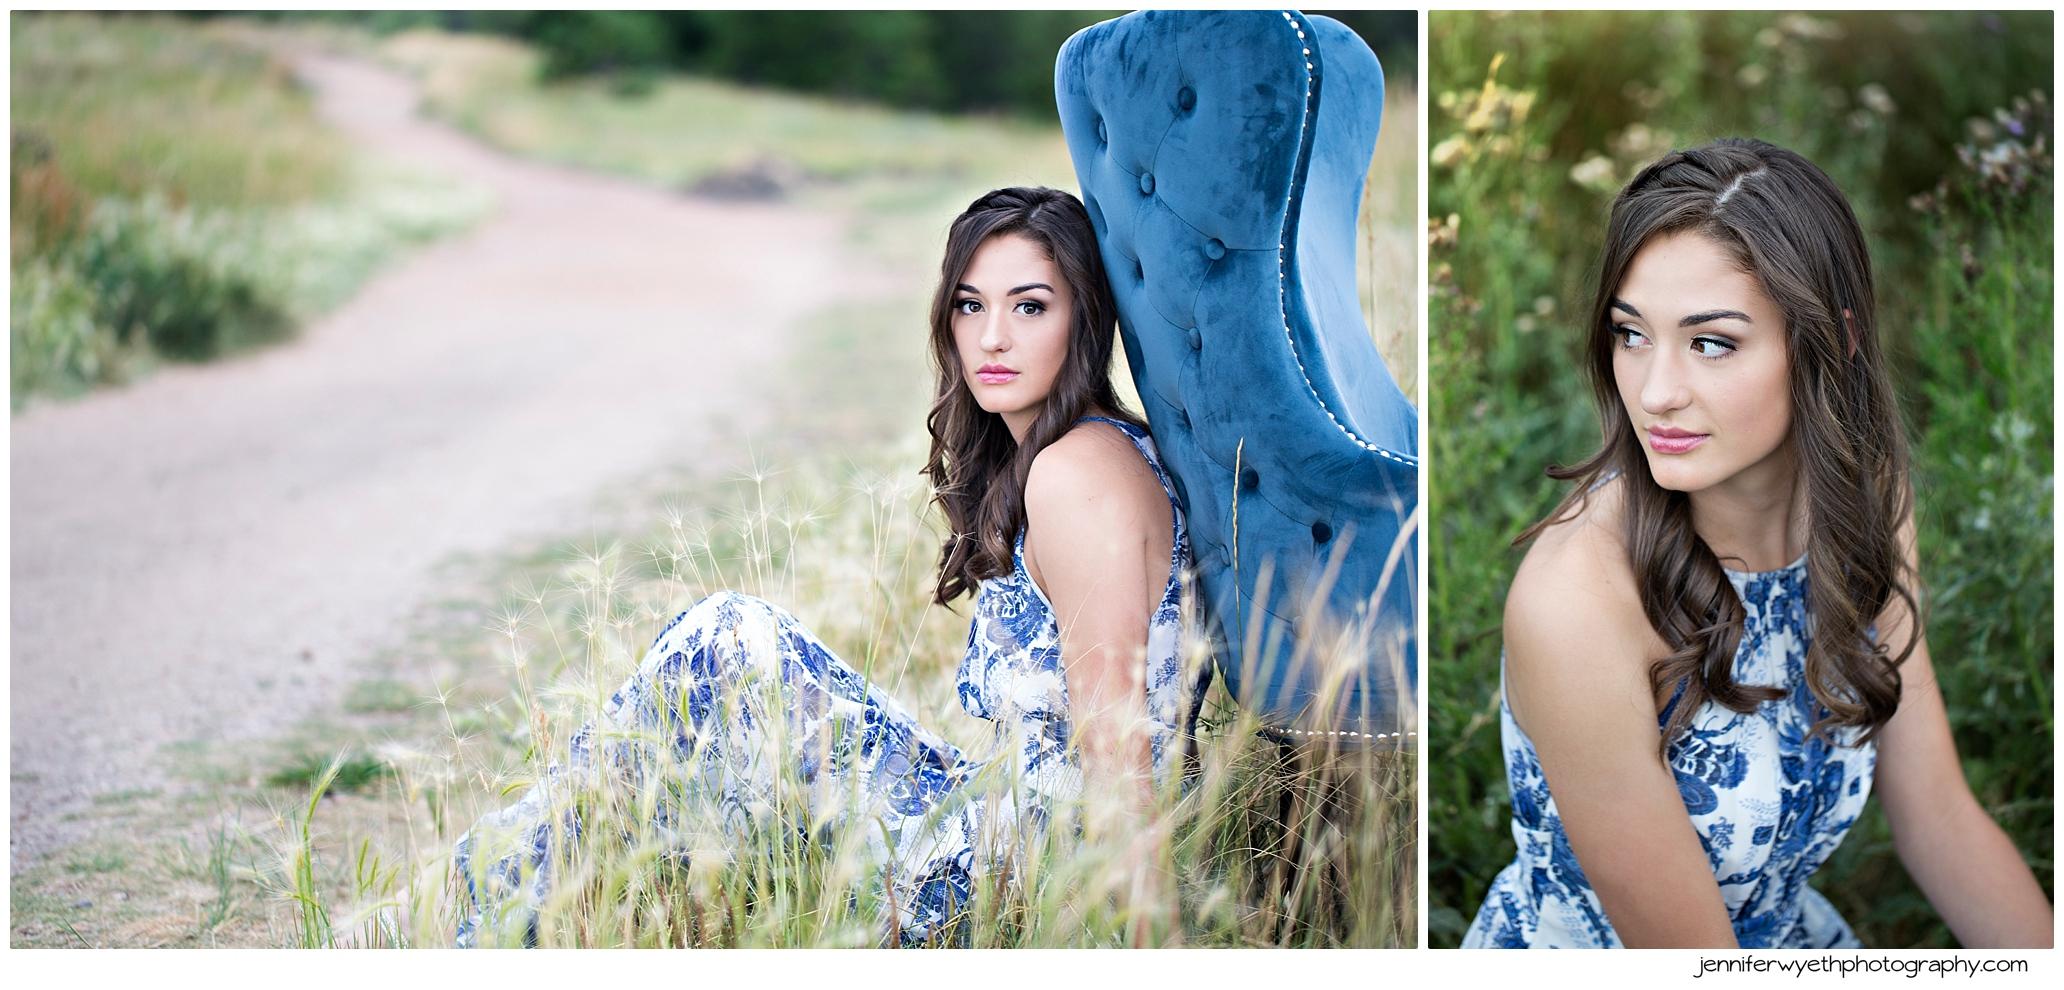 Jennifer-Wyeth-photography-senior-pictures-colorado-springs-photographer_0159.jpg